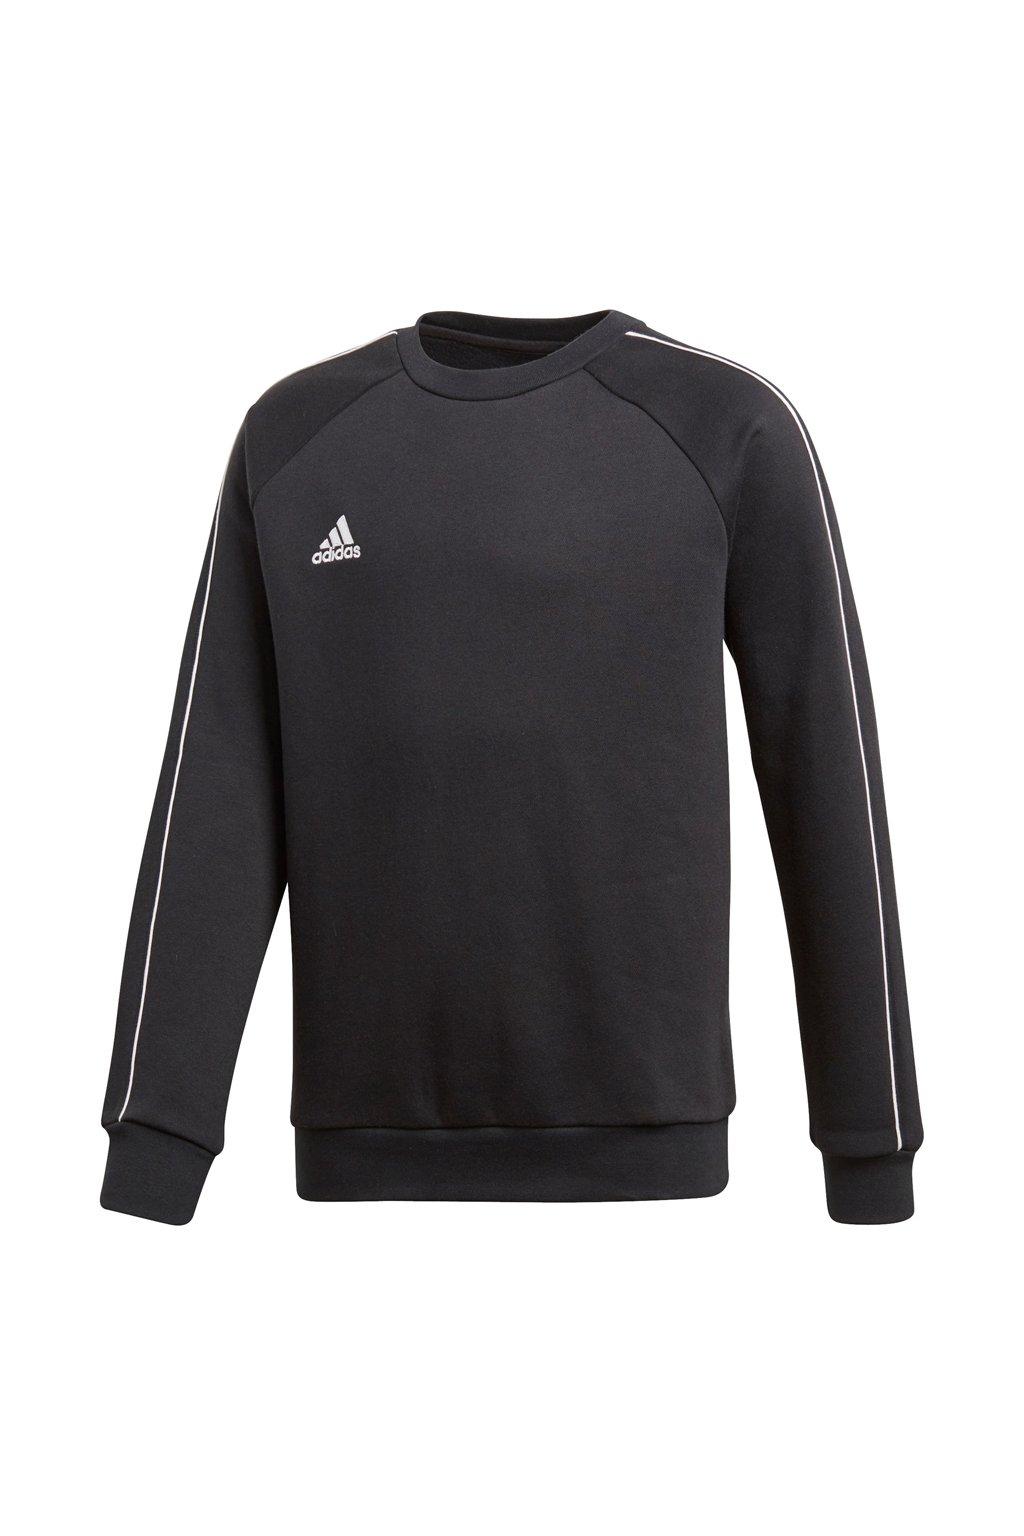 Detská mikina Adidas Core 18 Sweat Top JUNIOR čierna CE9062